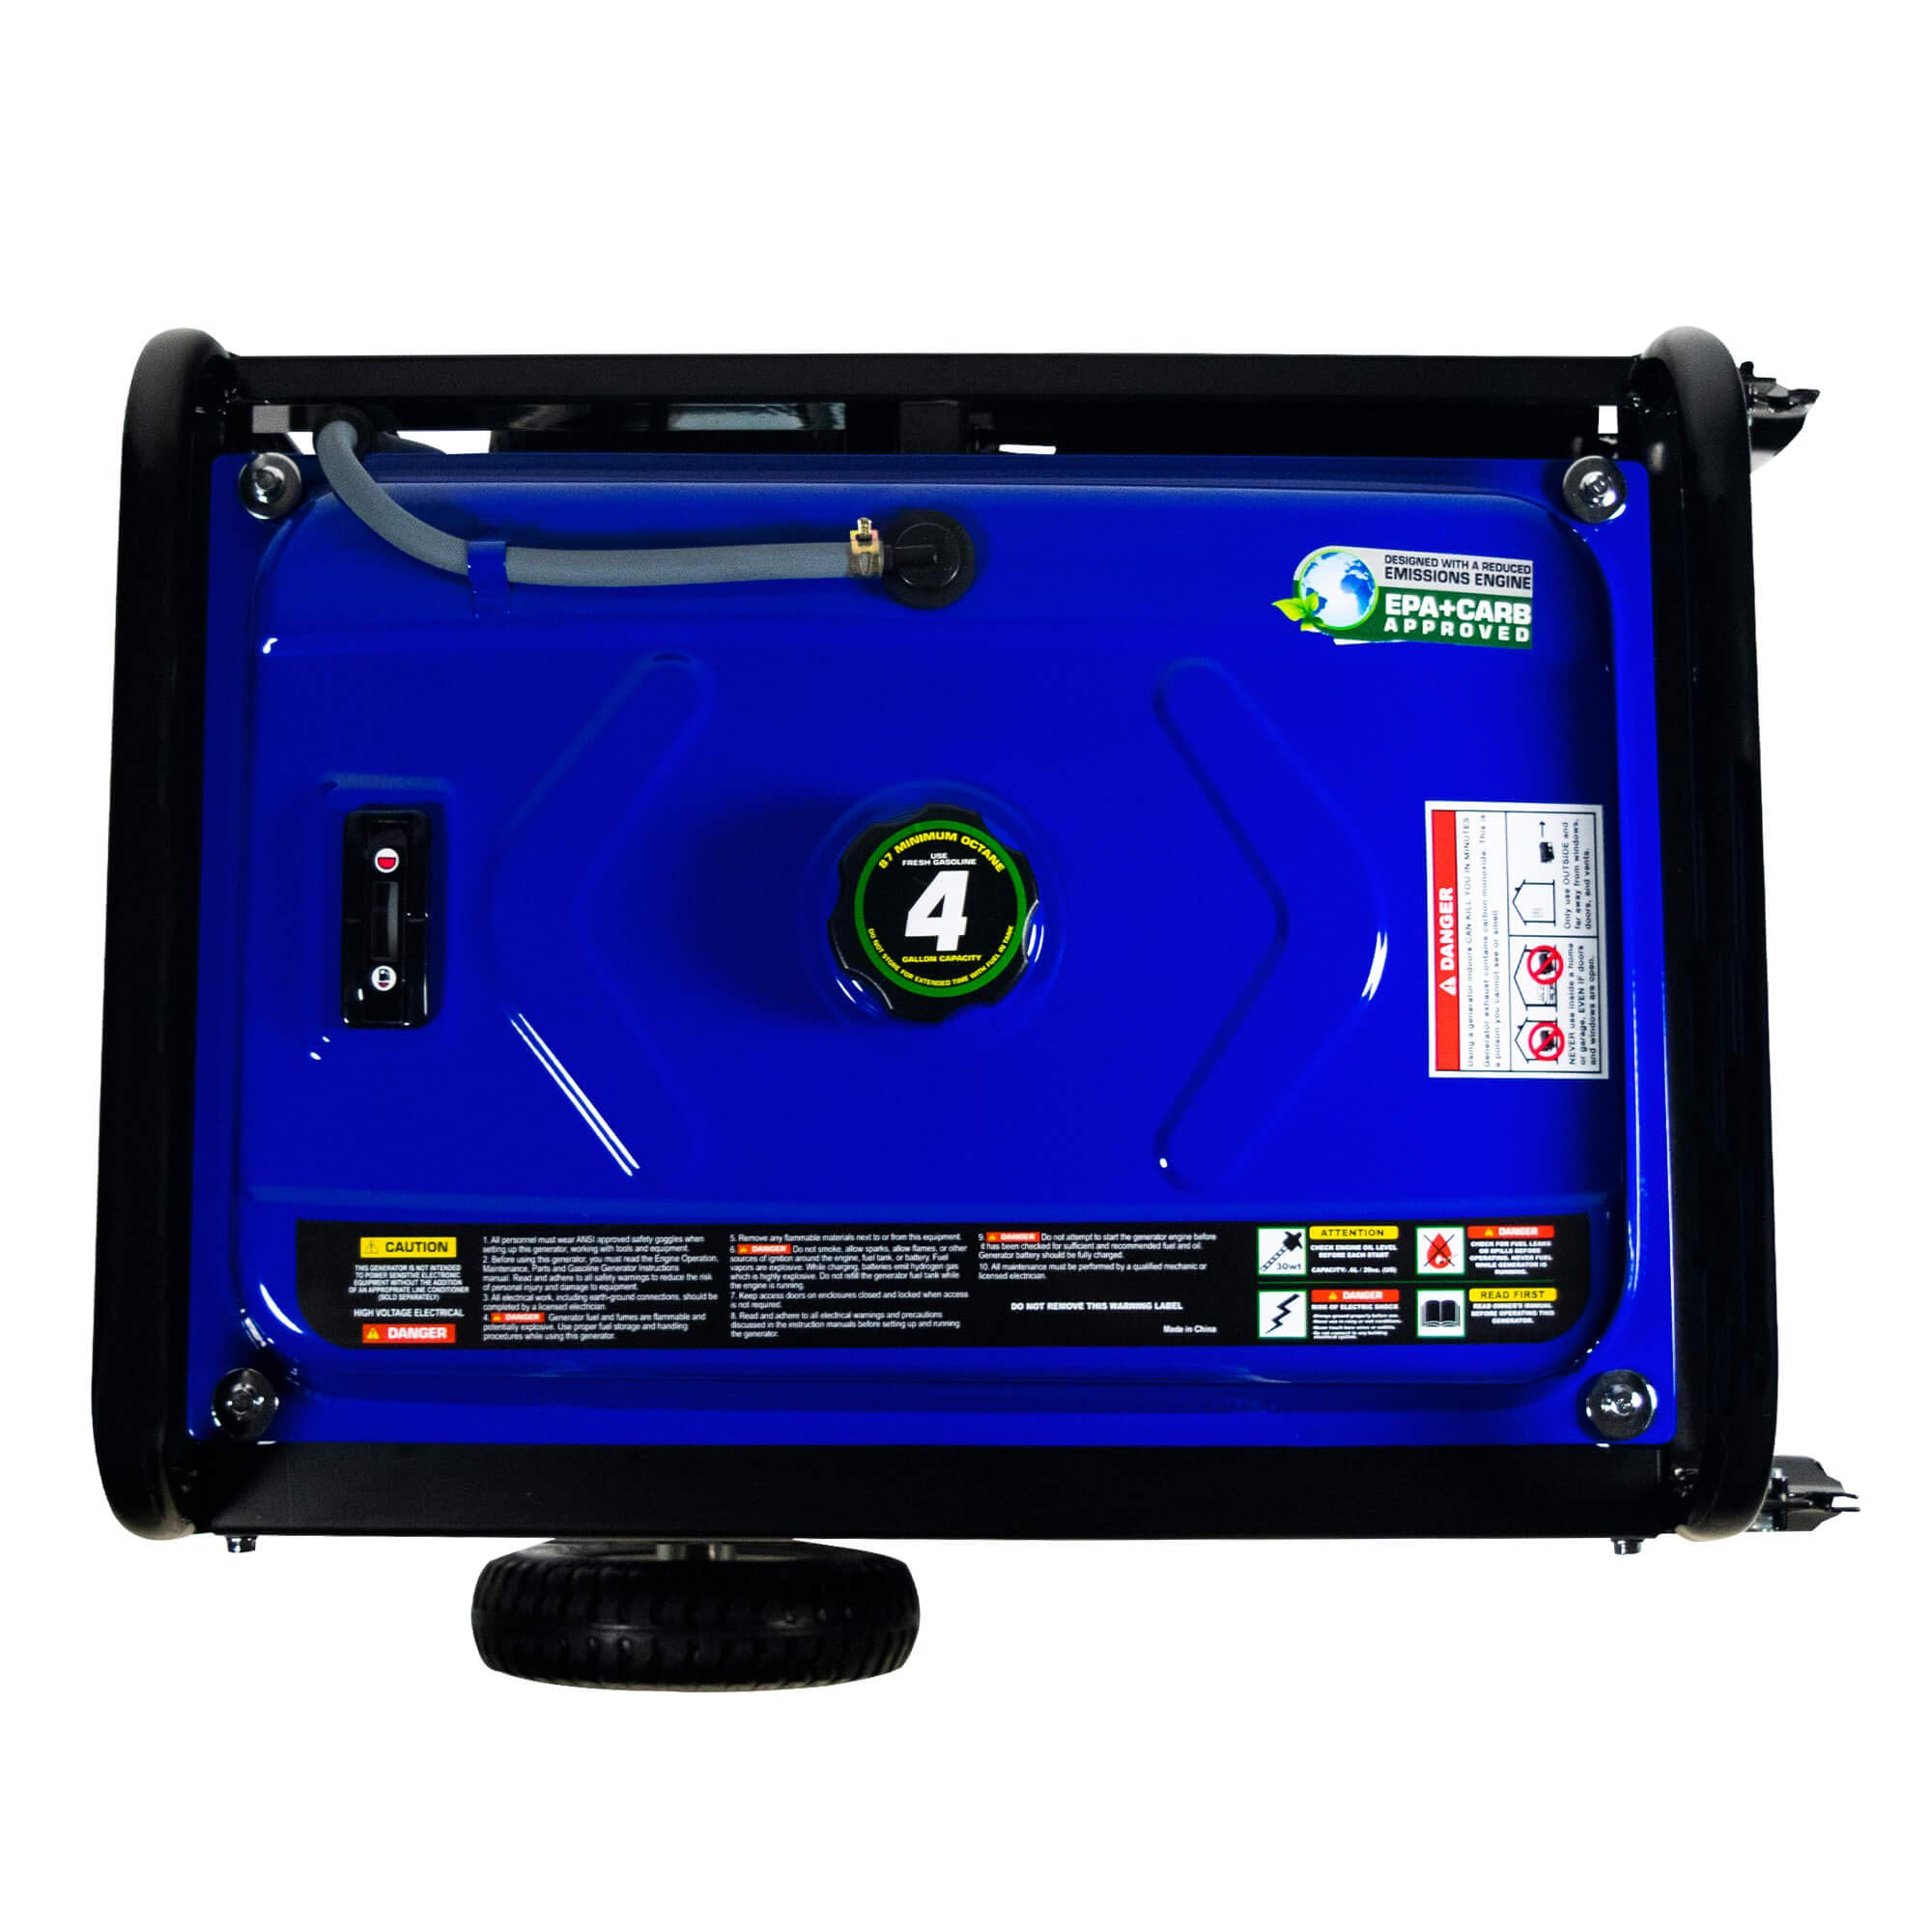 DuroMax Hybrid Dual Fuel XP4400EH 4,400-Watt Portable Generator by DuroMax (Image #11)